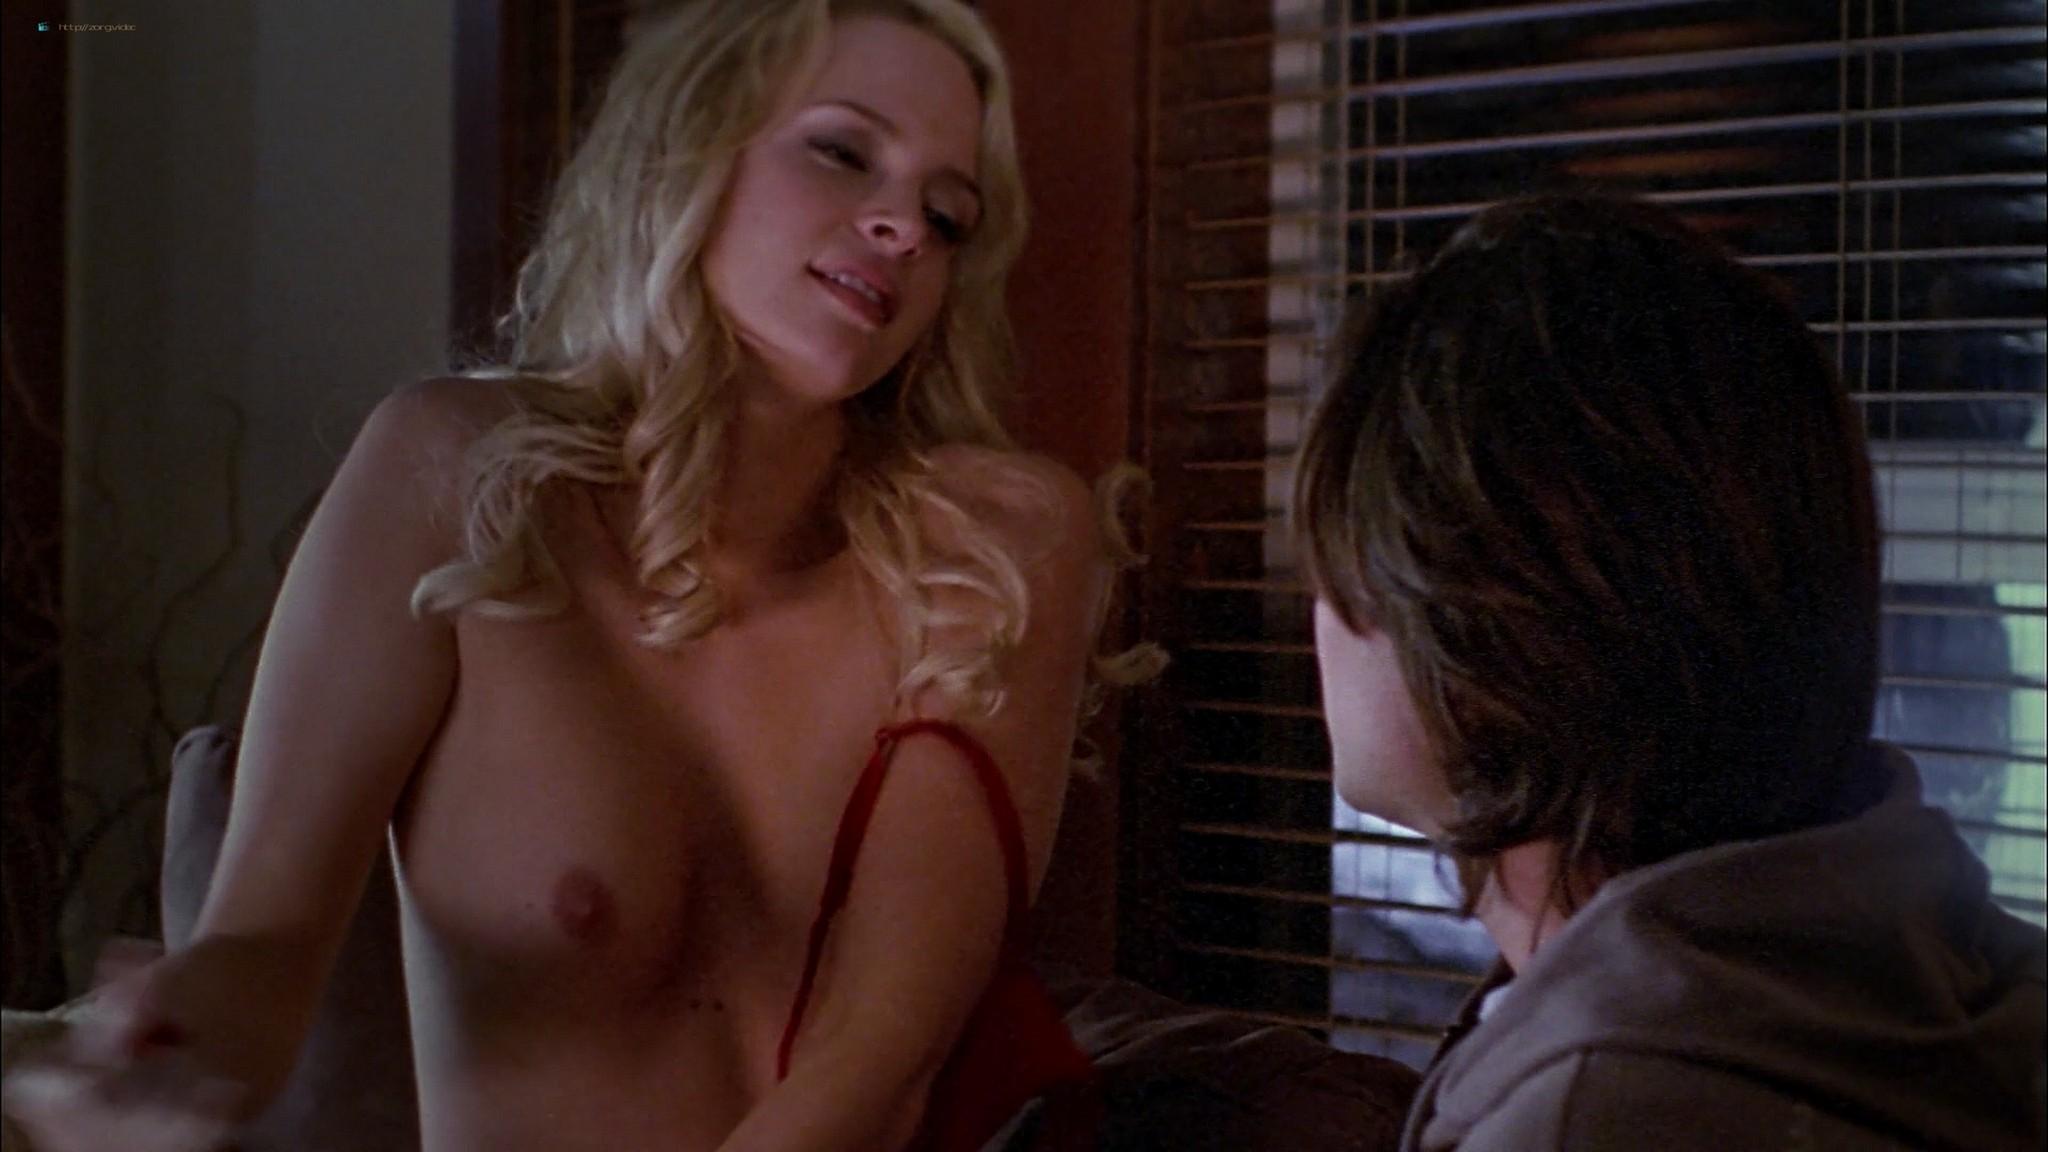 Lindsay Maxwell nude Amber Borycki sexy - Revenge of the Boarding School Dropouts (2009) HD 1080p Web (11)